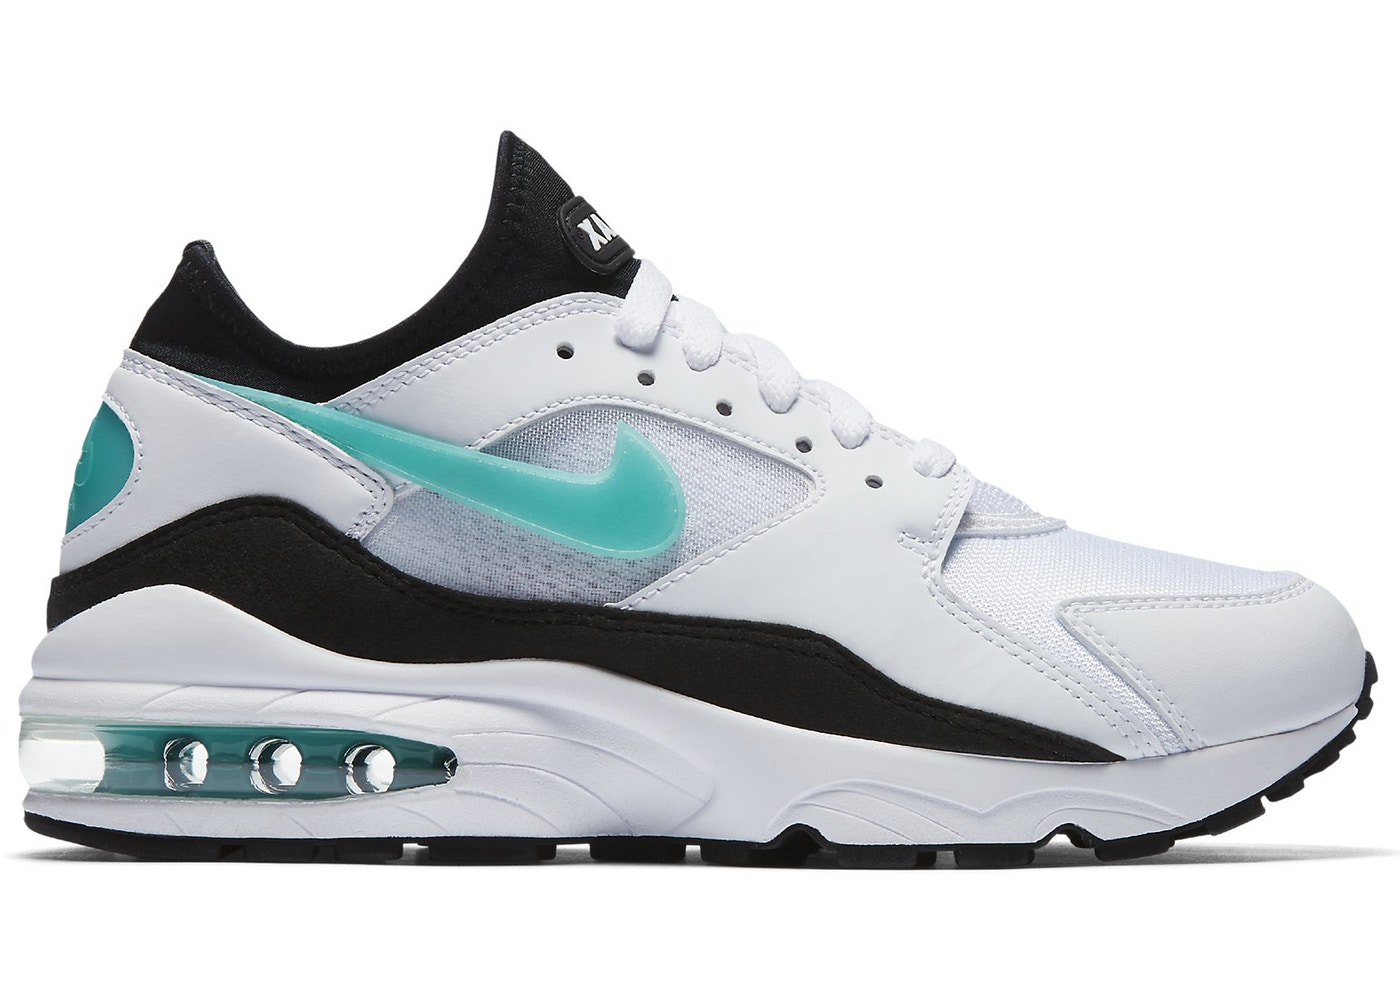 10a3a706da Nike Air Max Other Shoes - Volatility